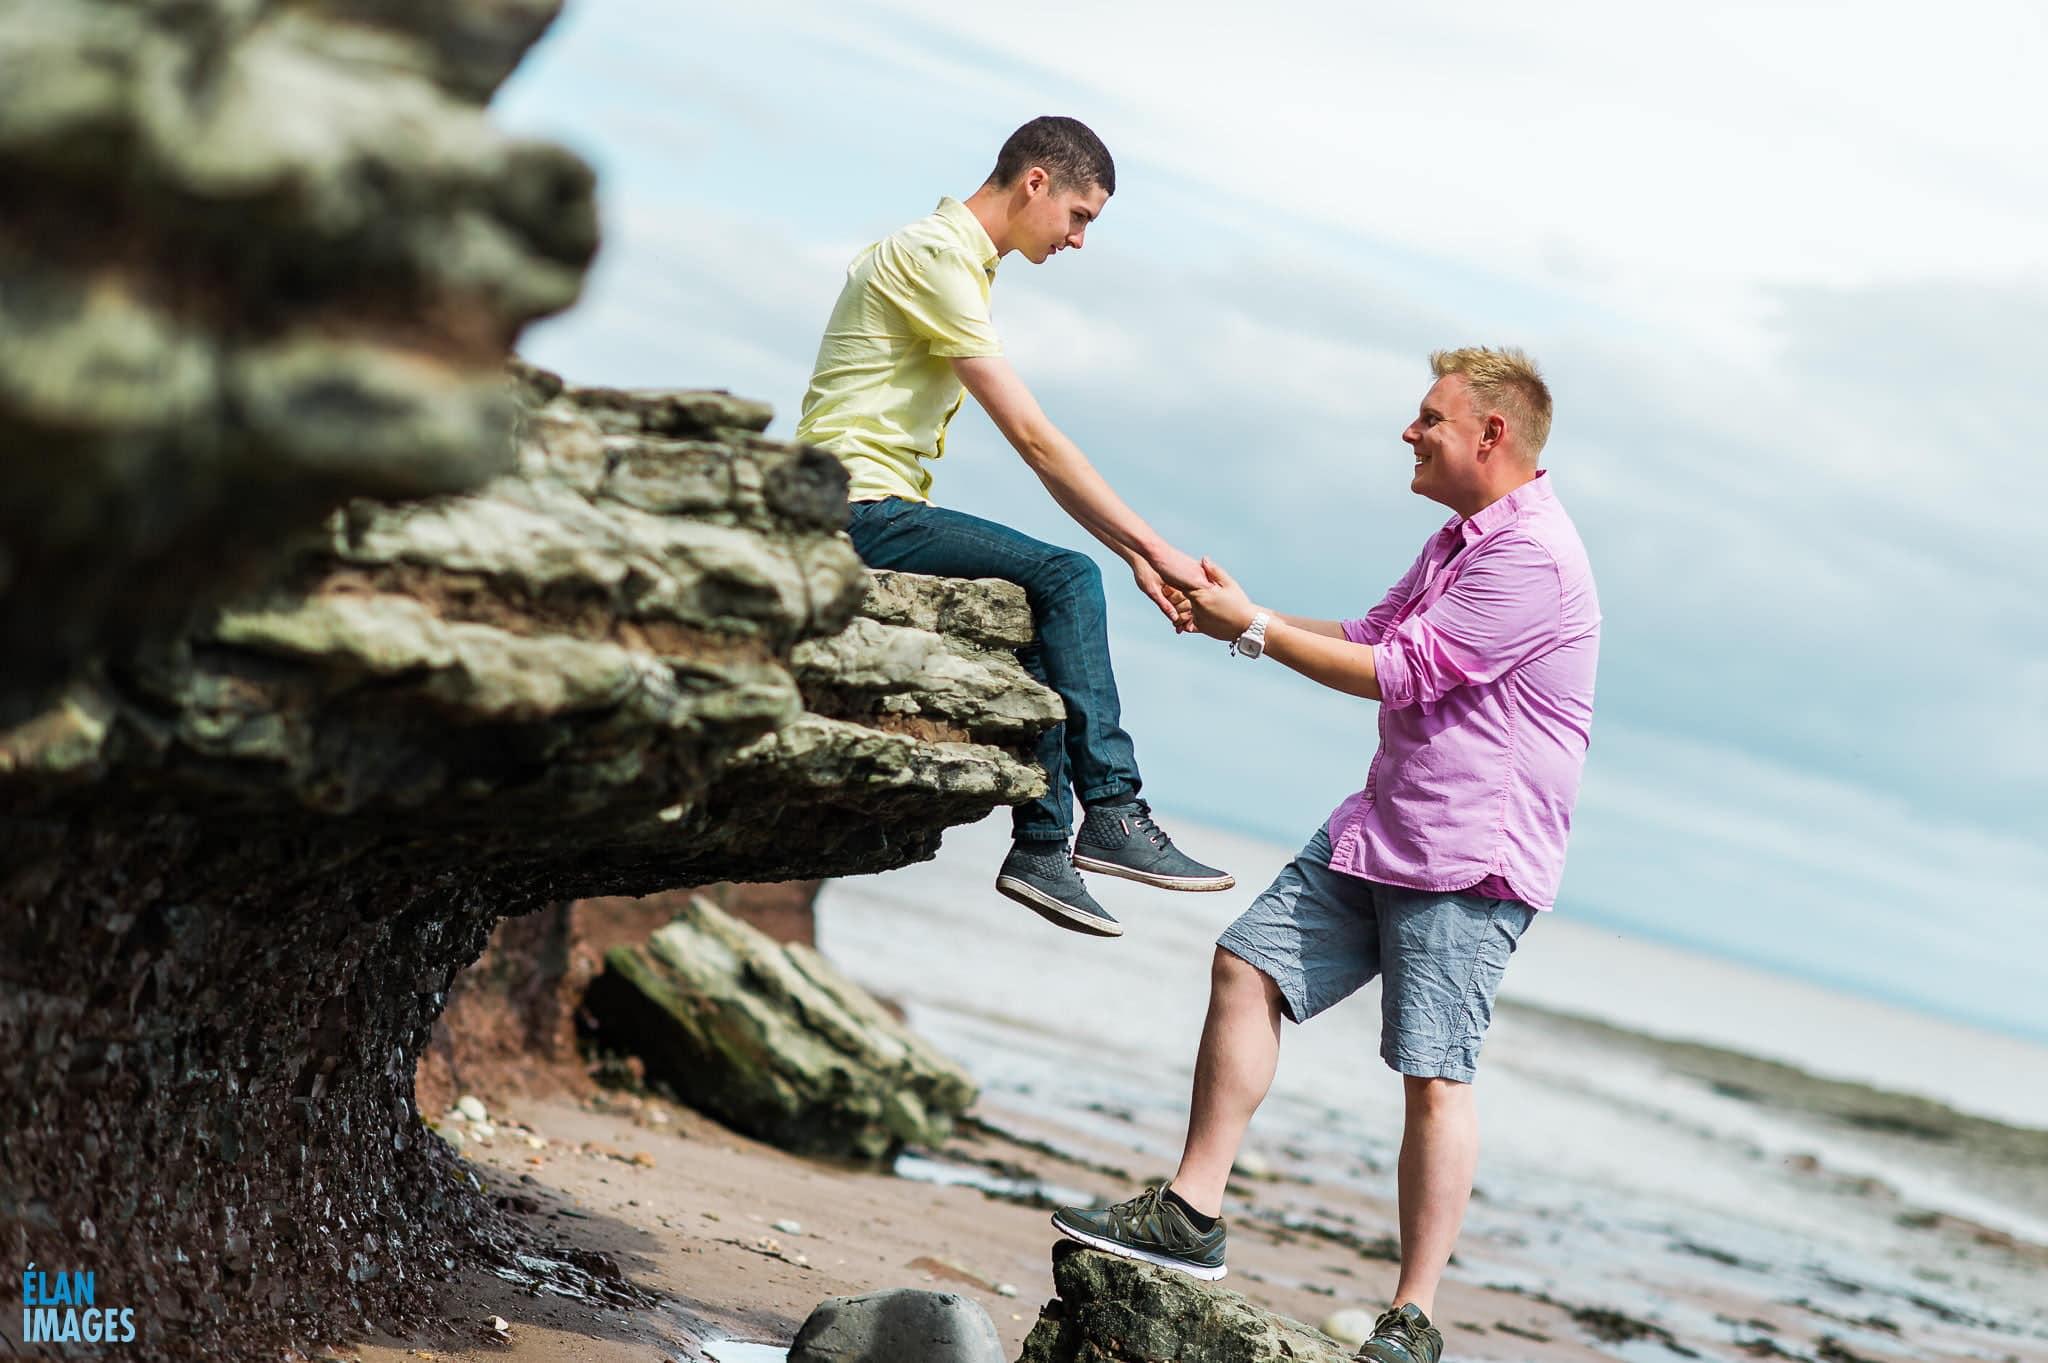 Engagement photo shoot at St Audrie's Bay, Devon 6